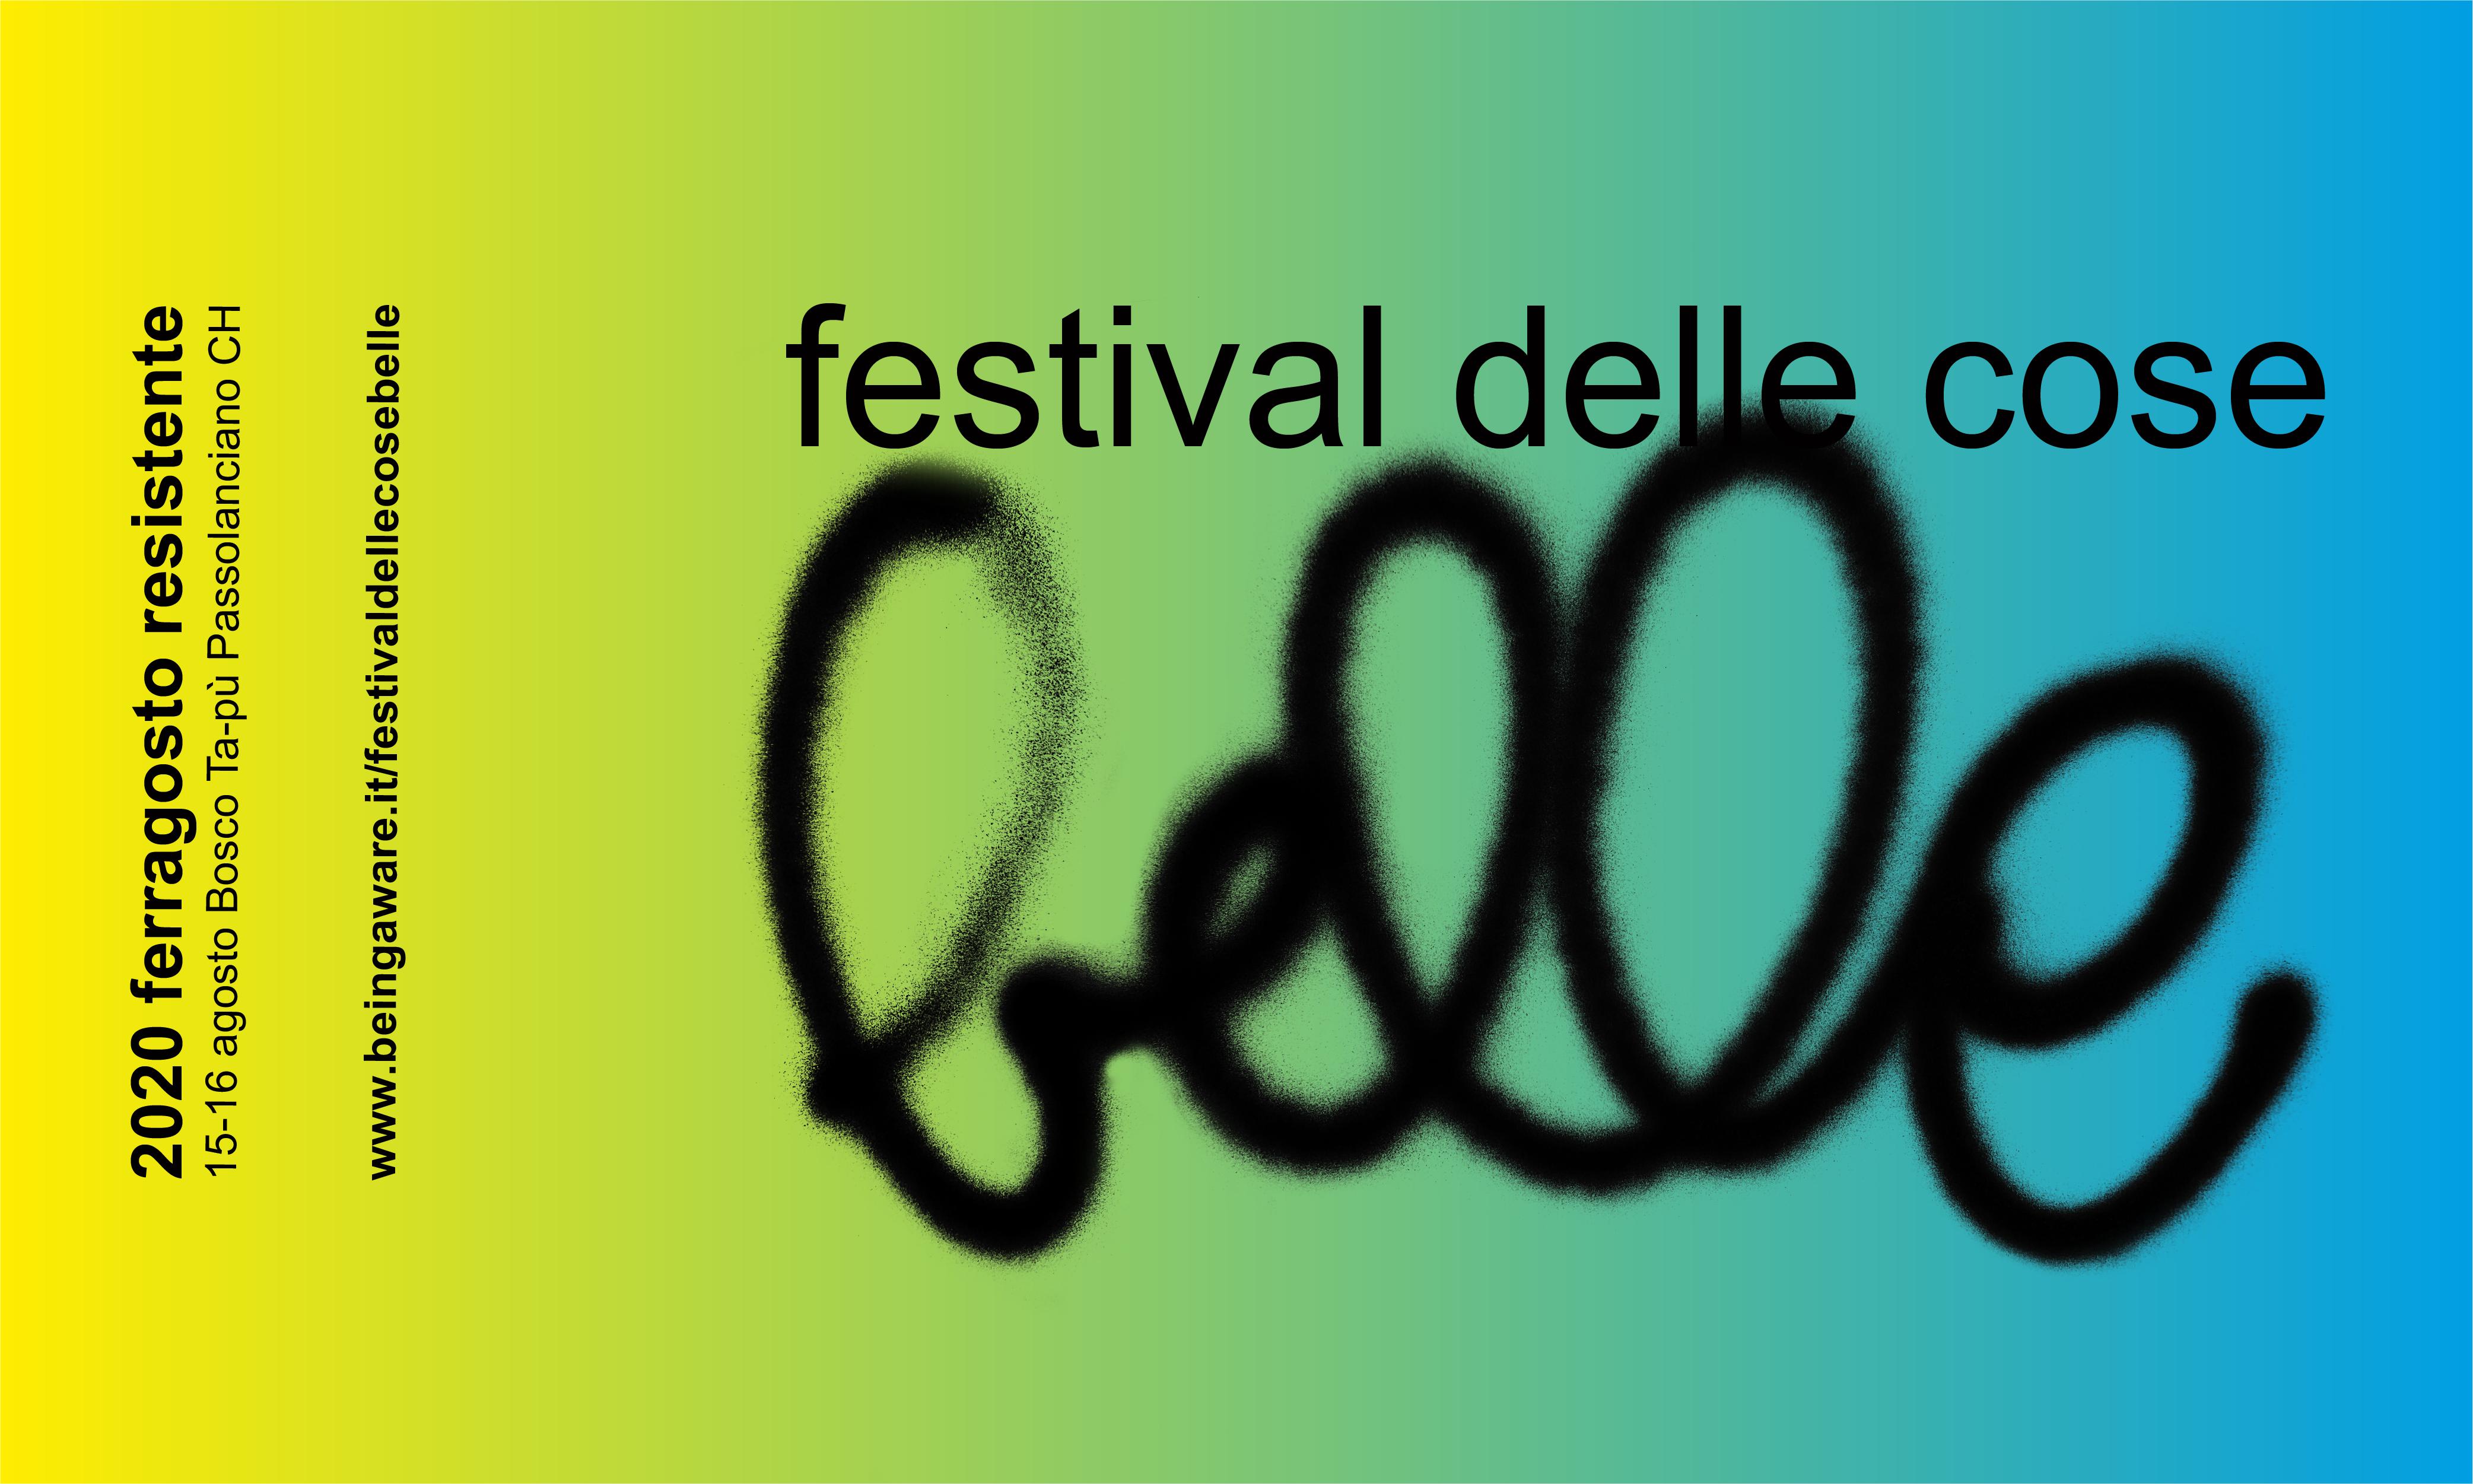 Festival delle cose belle